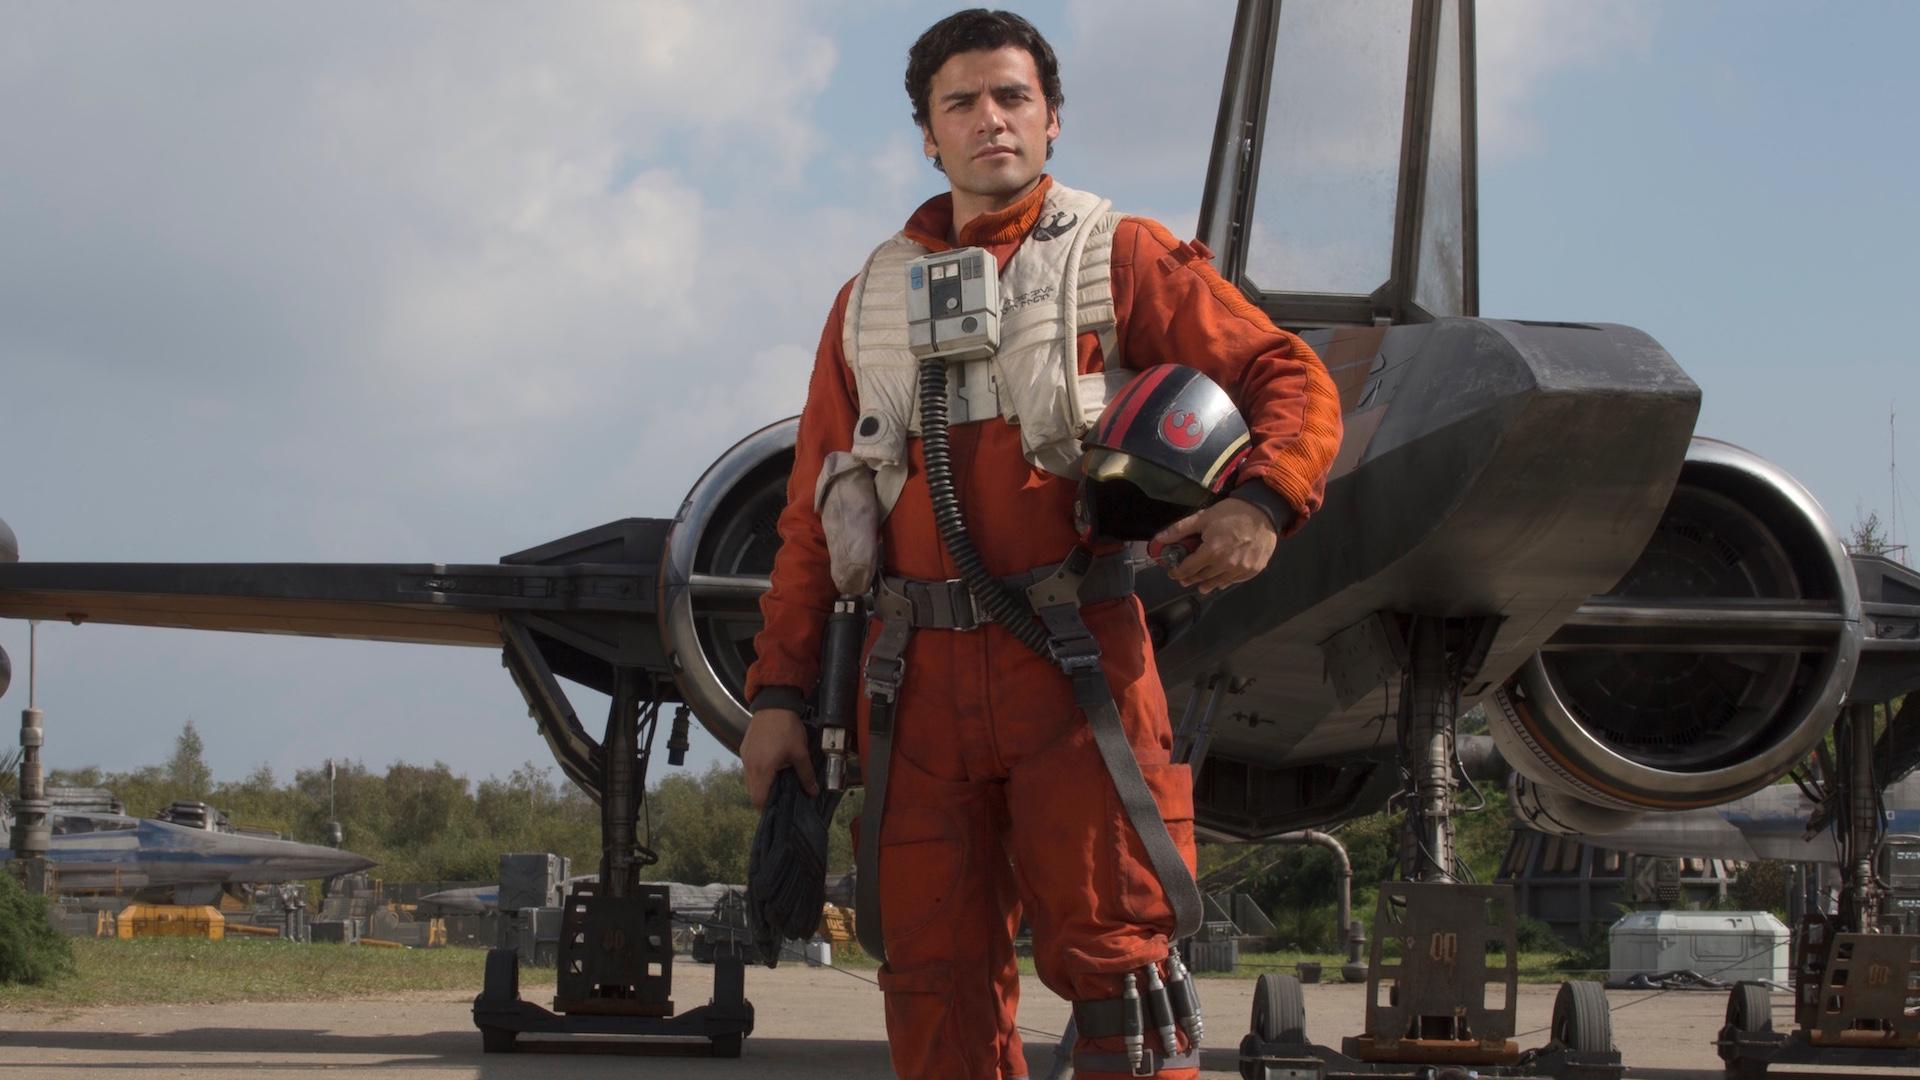 Star Wars Episode Viii Spoiler Details Involving Poe Dameron And General Organa Geektyrant